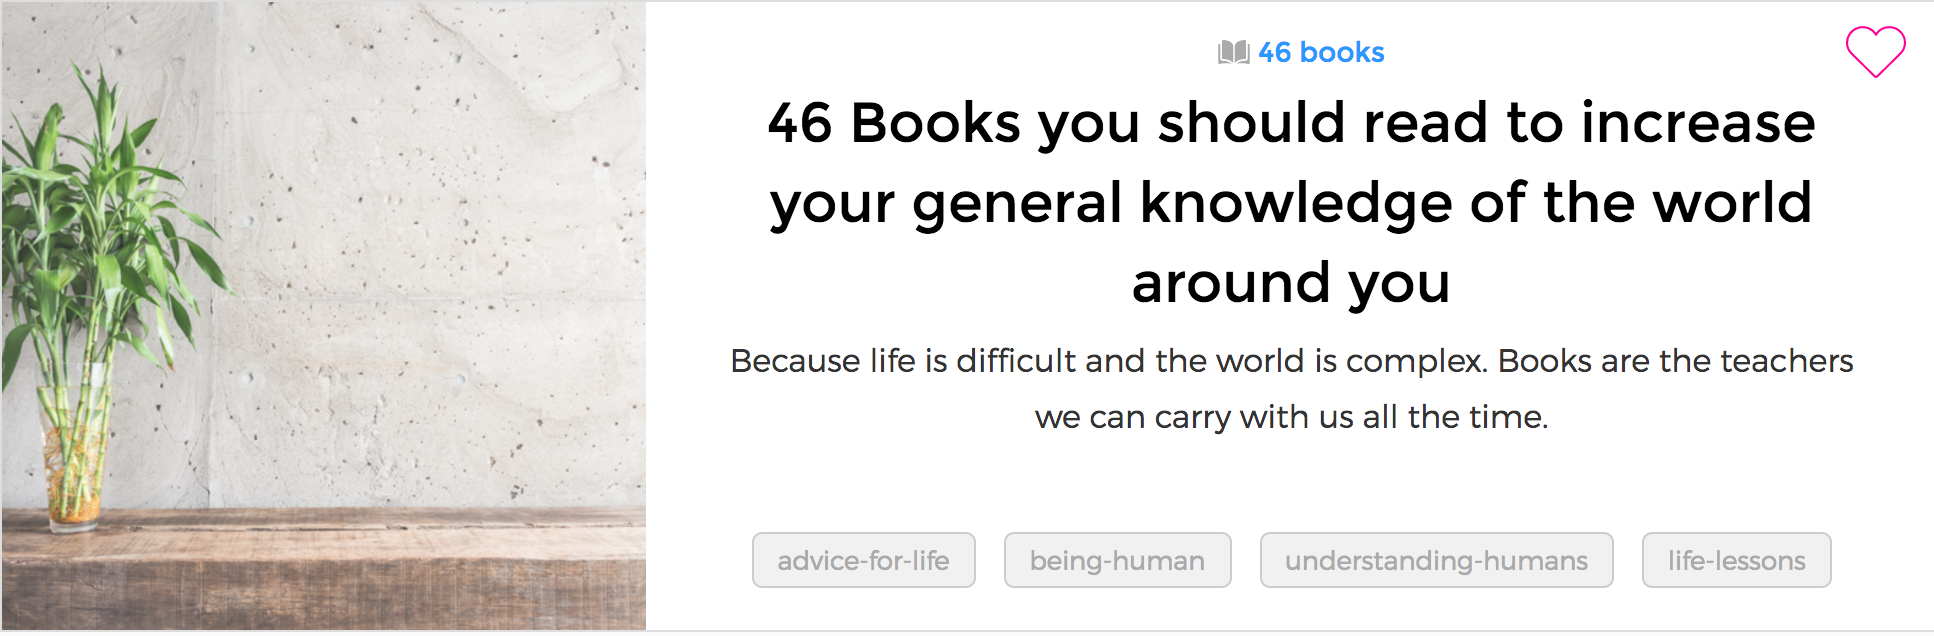 I don't read a lot, and that's a problem, so I decided that